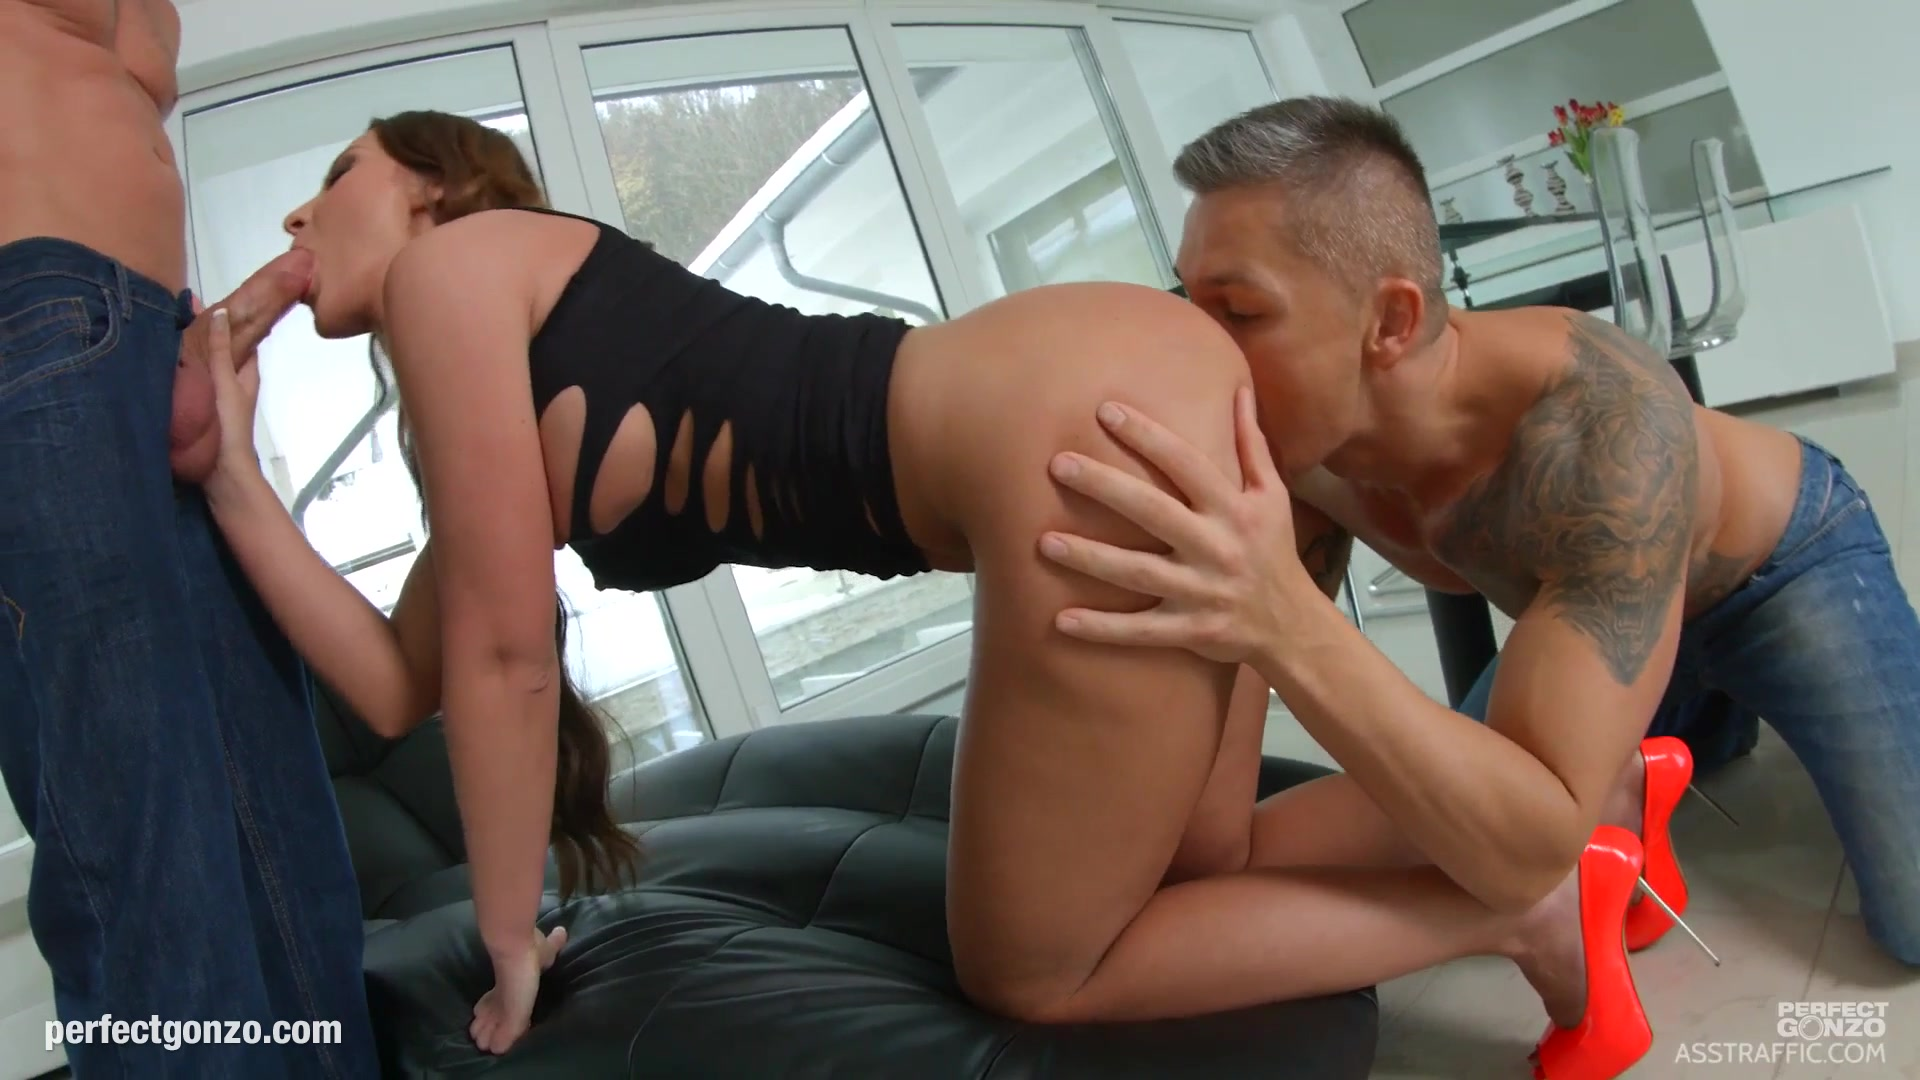 free tourcher and bondage Sex photo